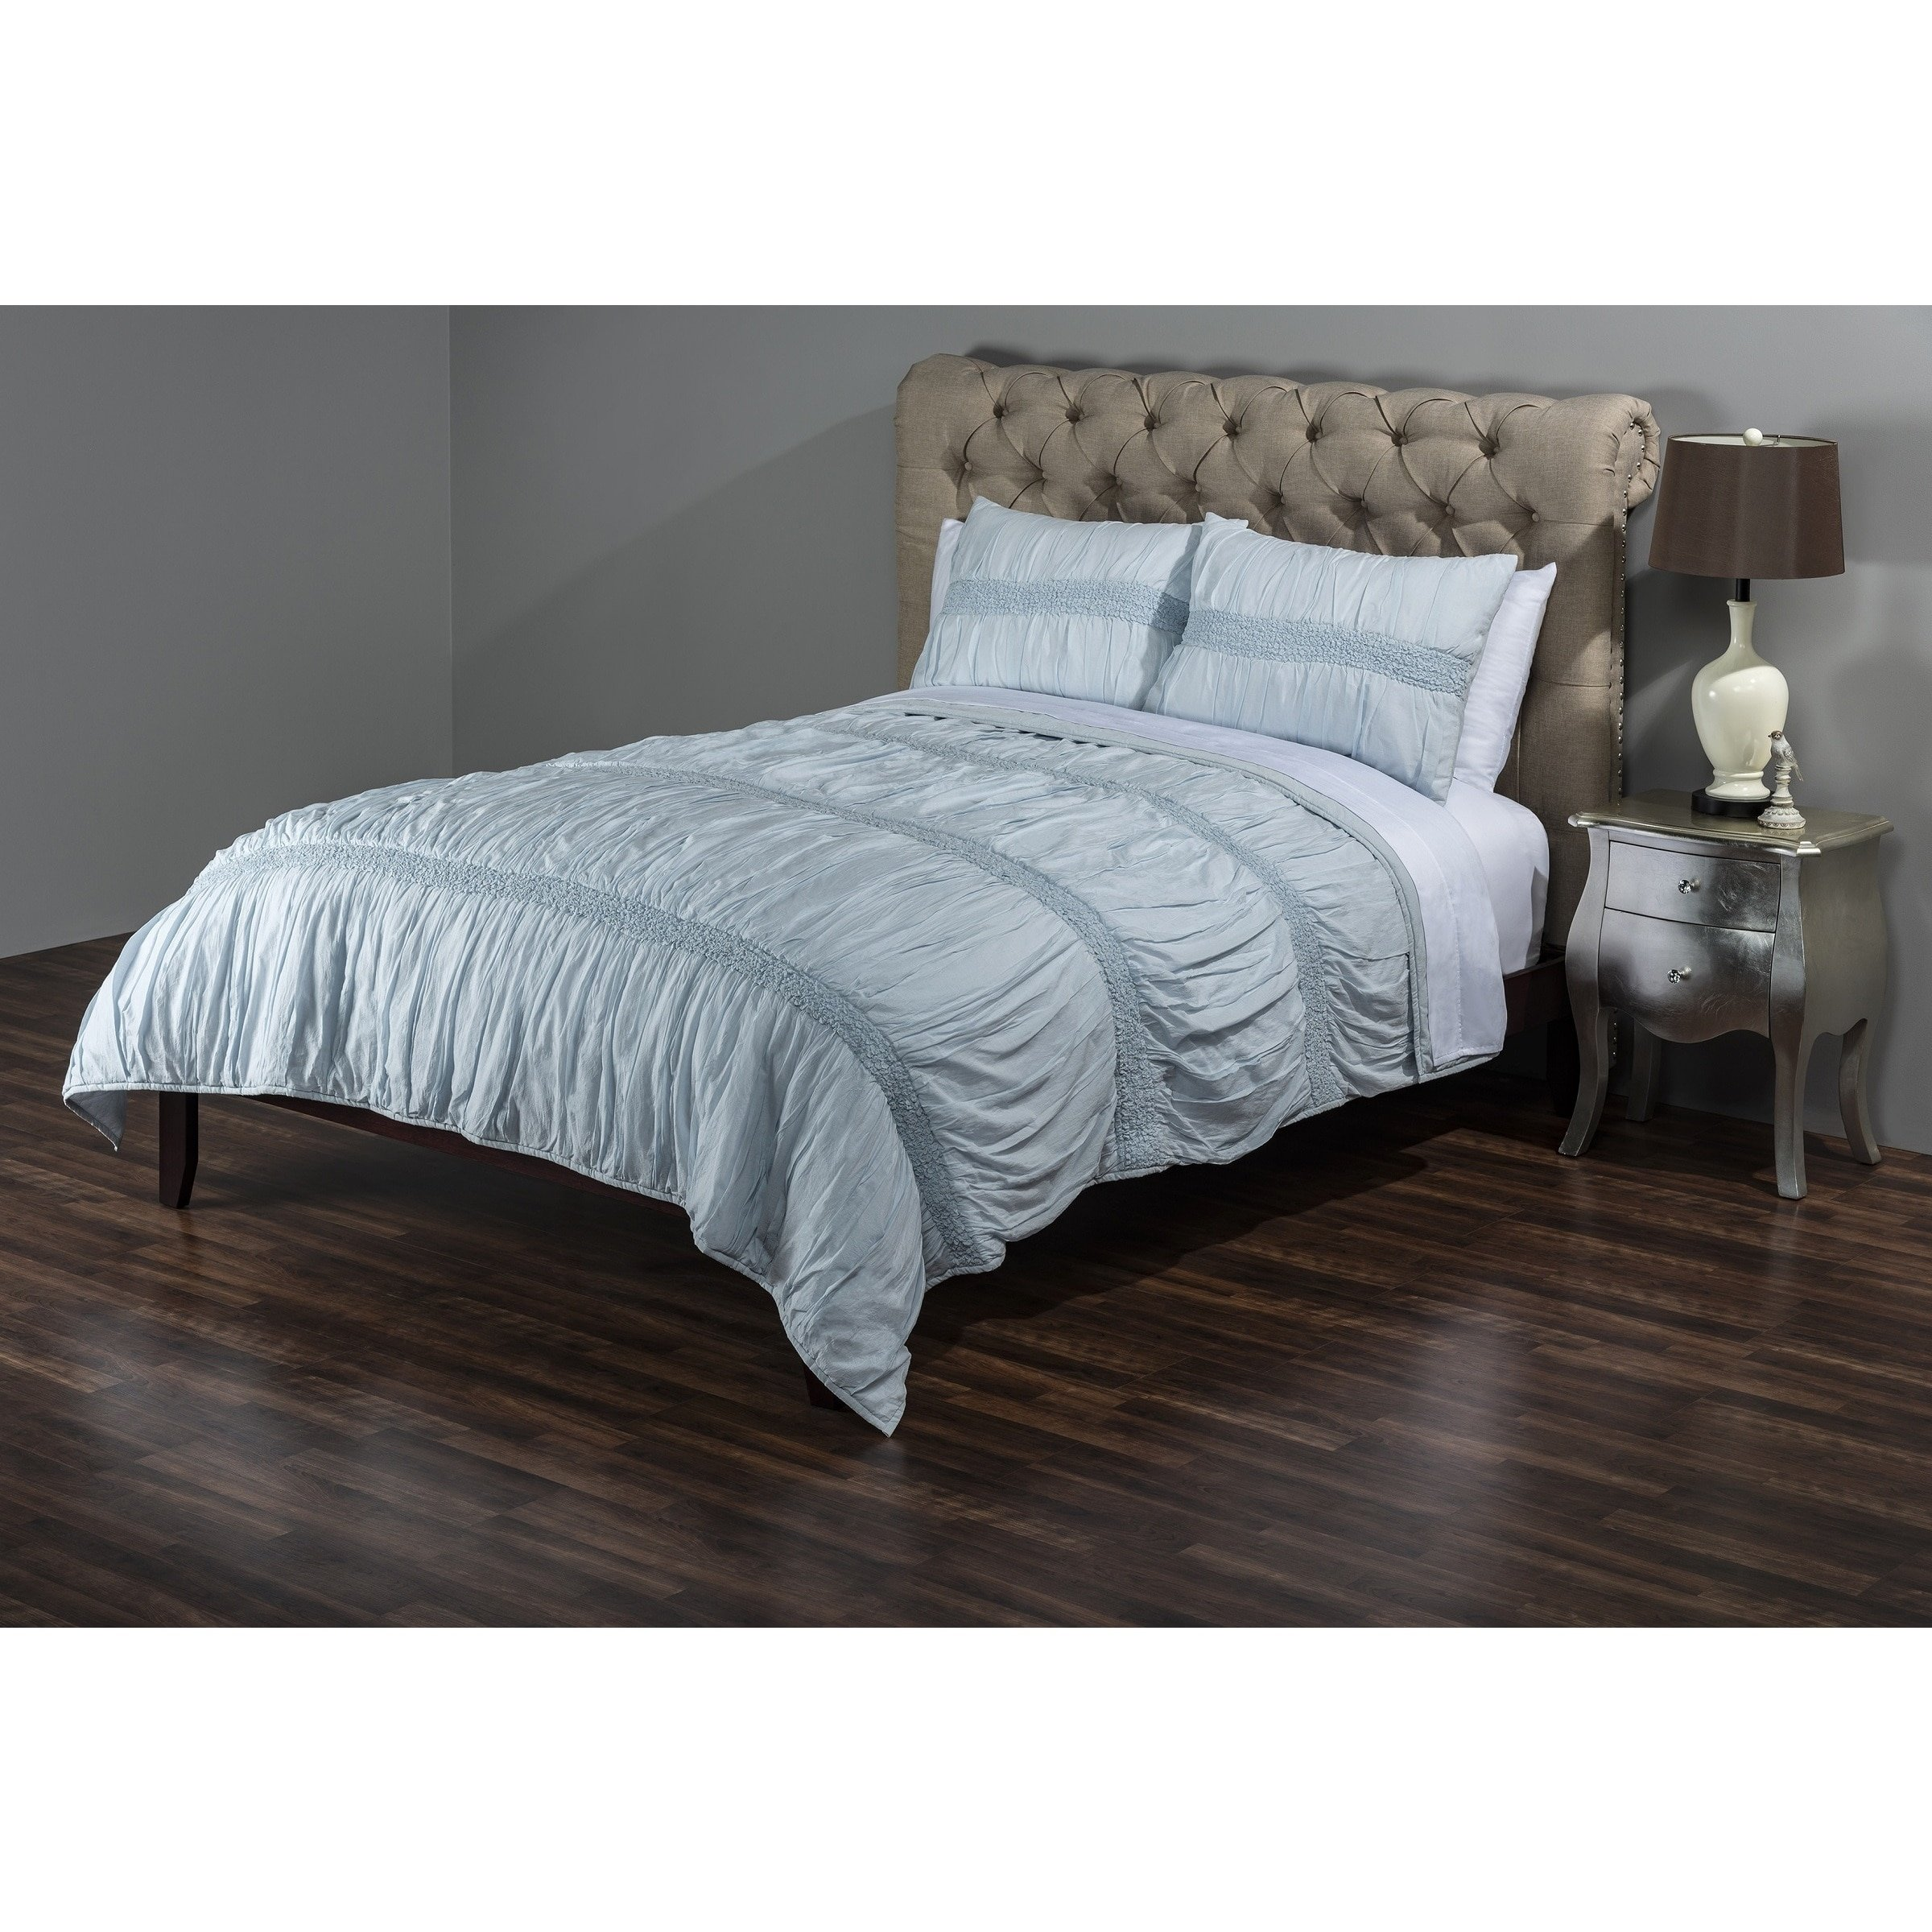 Rizzy Home QLTBT3043IB009092 Quilt, Spa Blue, Queen